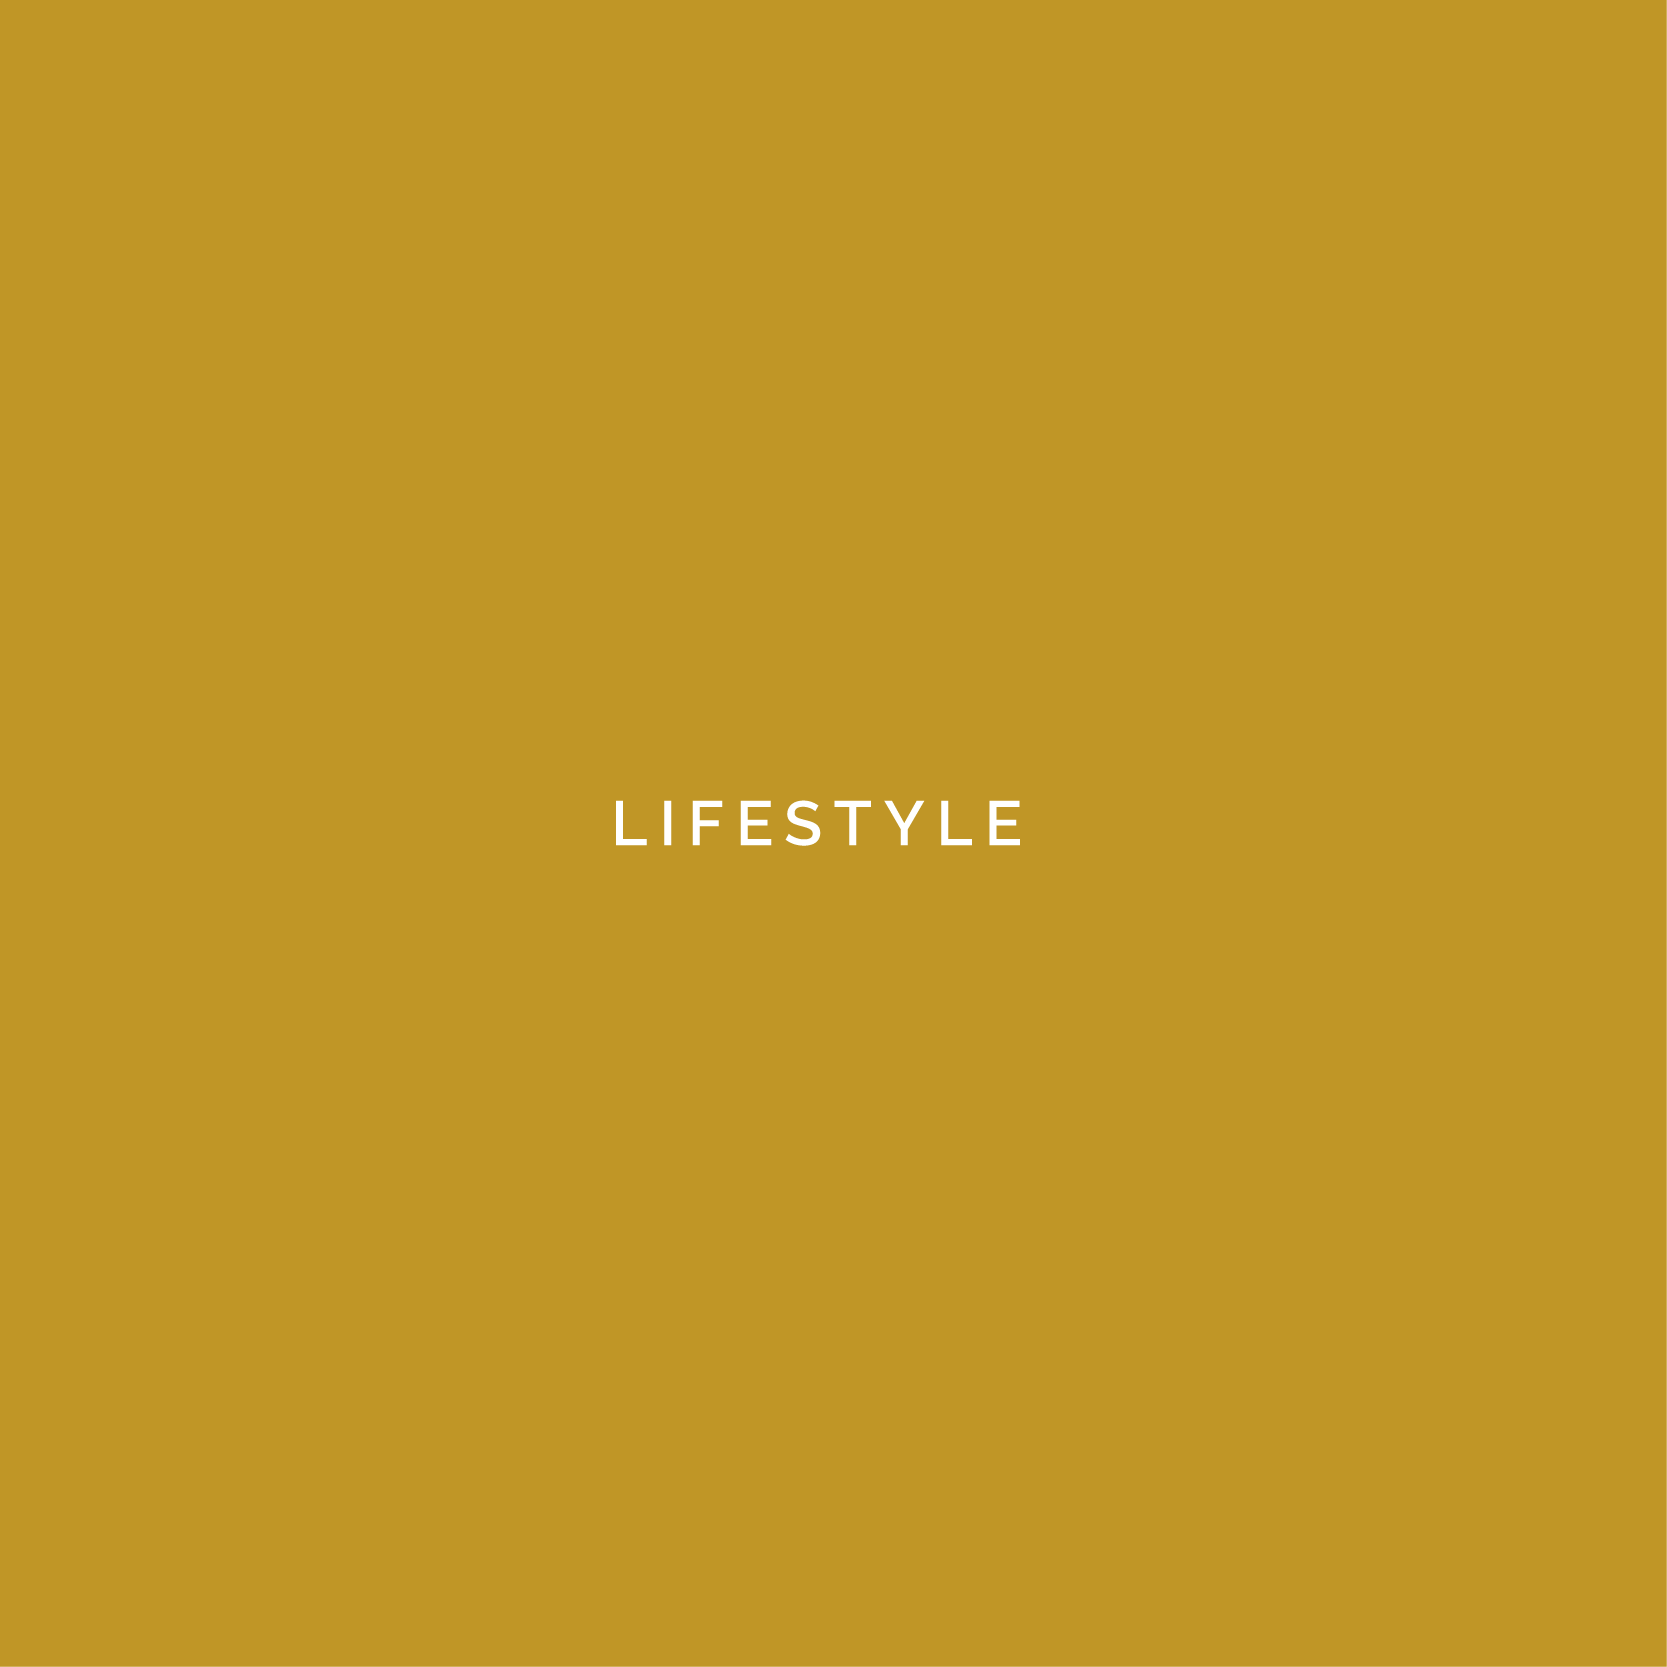 lifestyle-01